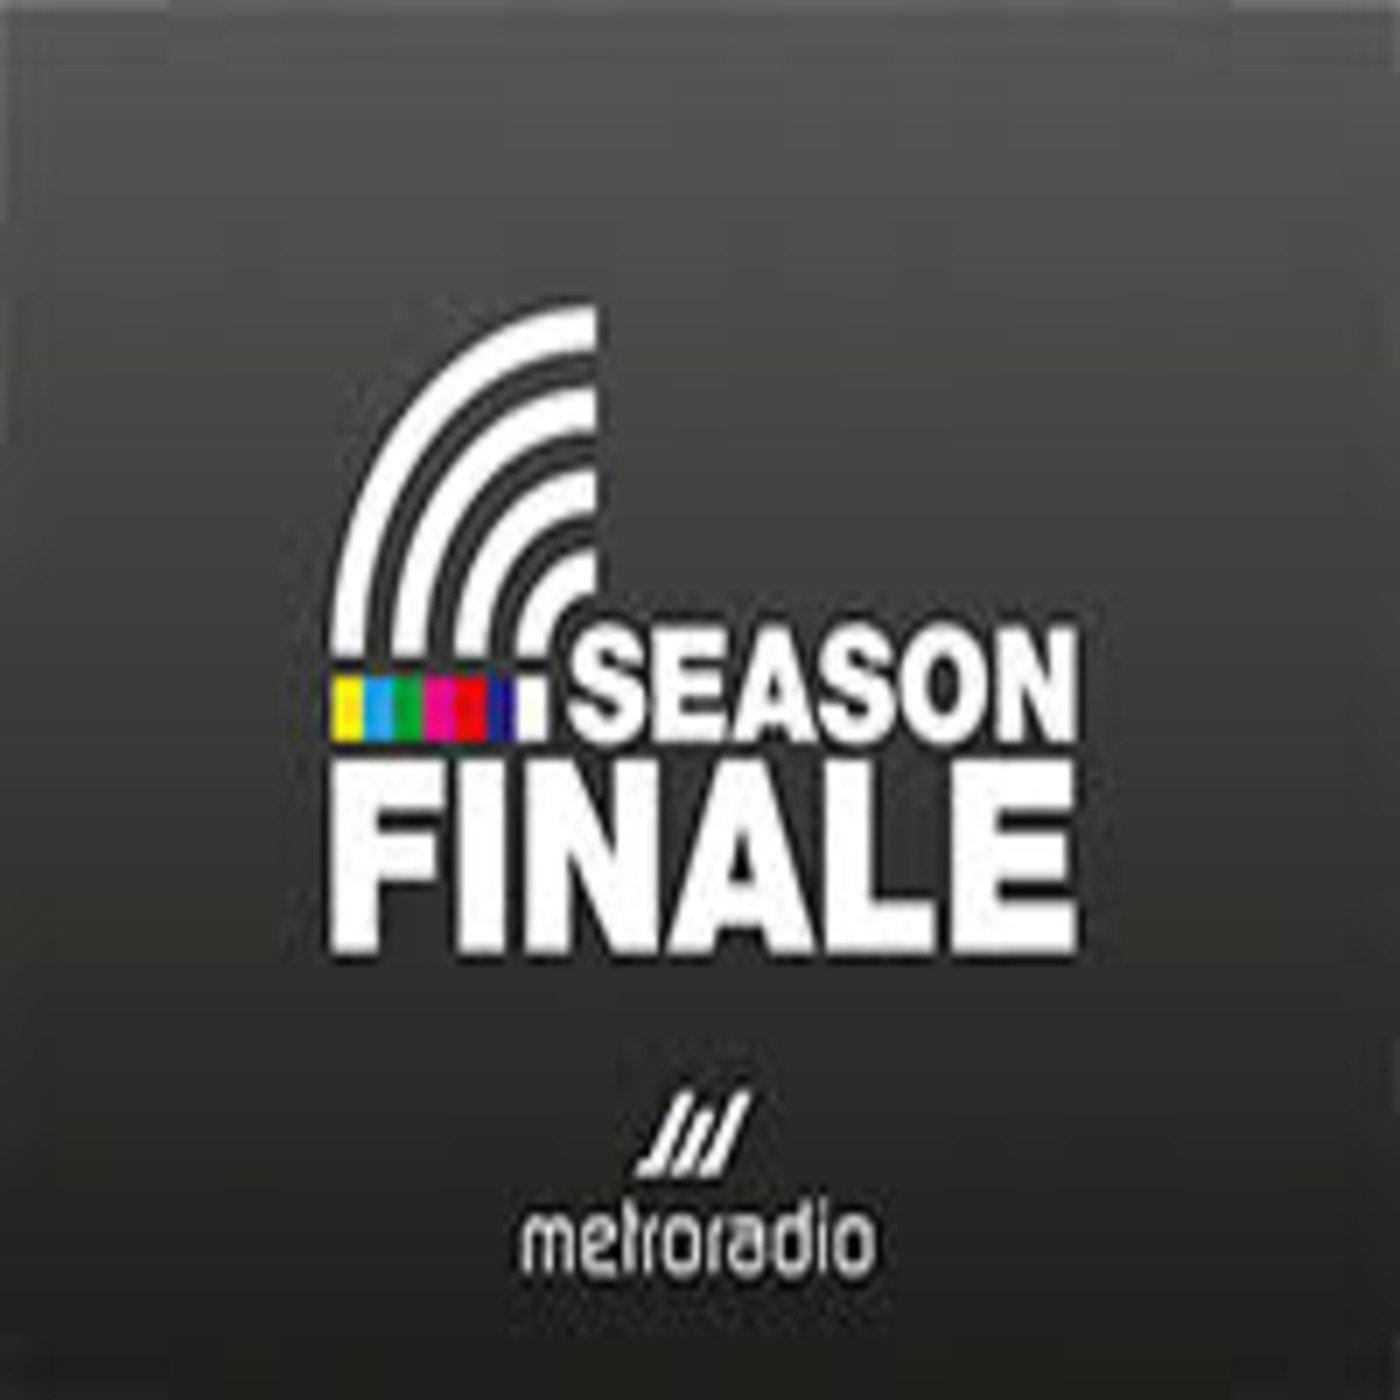 <![CDATA[Season Finale]]>